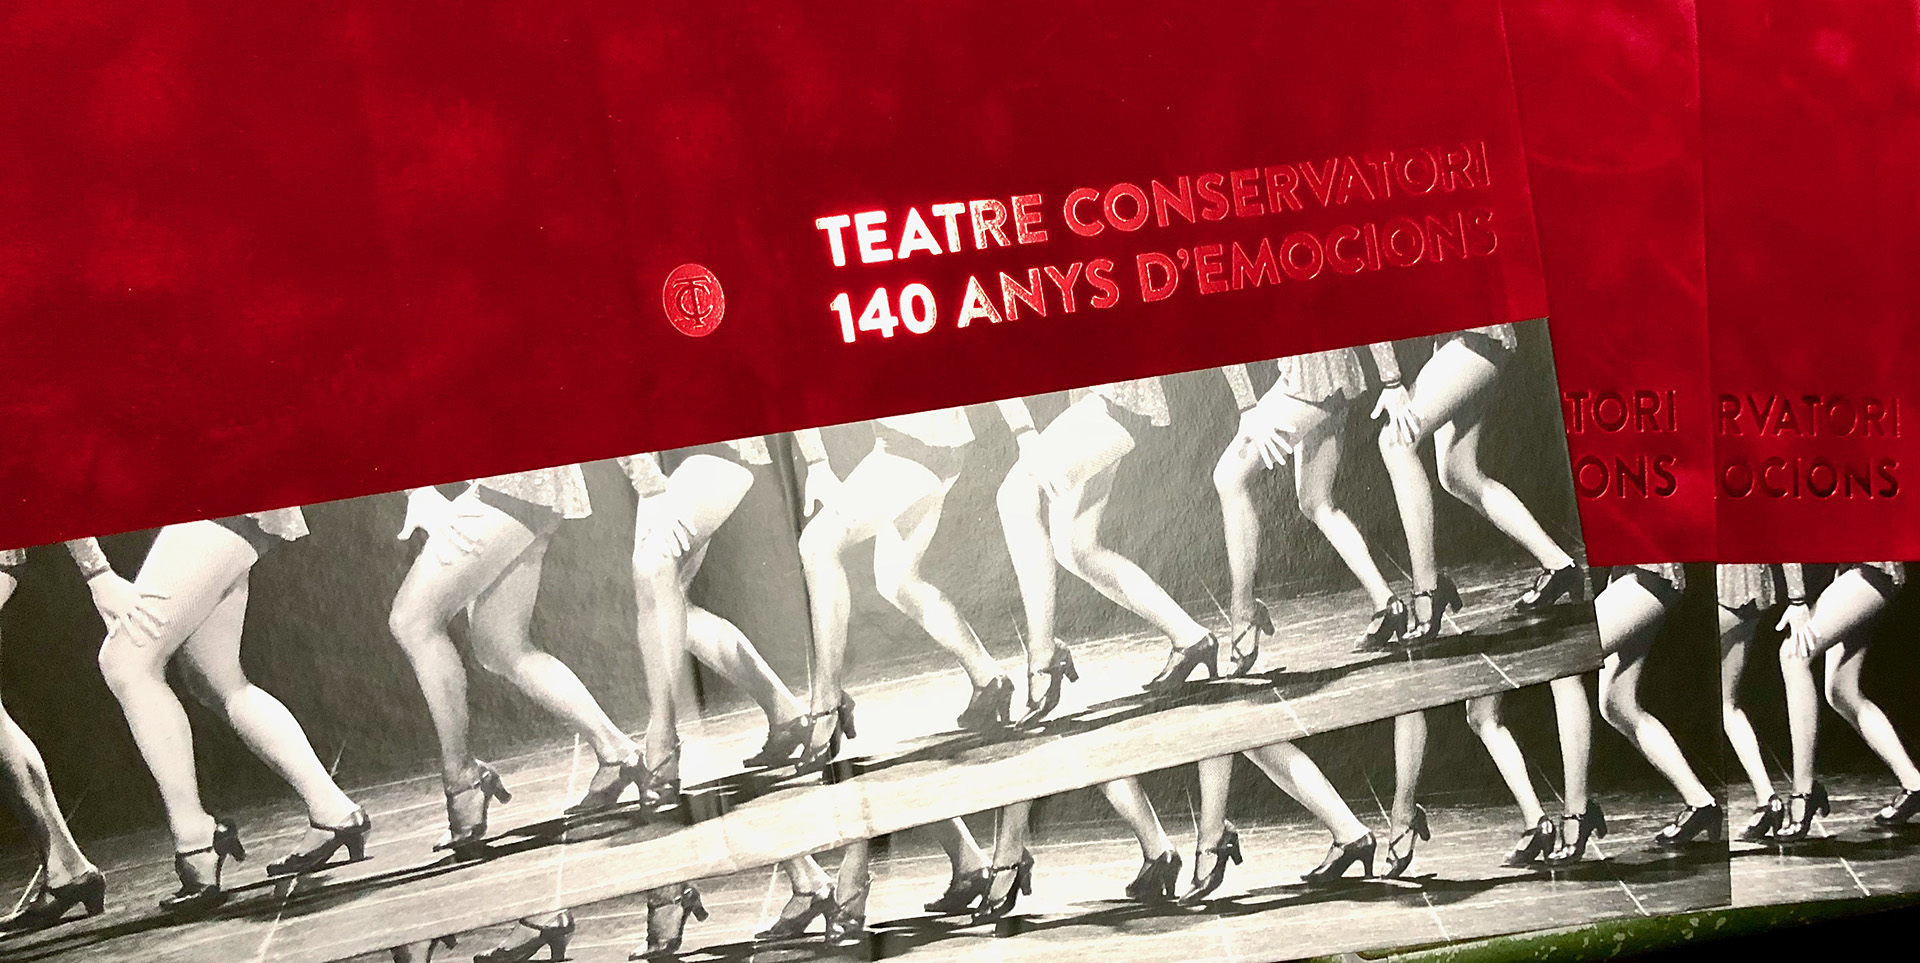 Detalles stamping rojo metalizado portada libro especial Teatre Conservatori